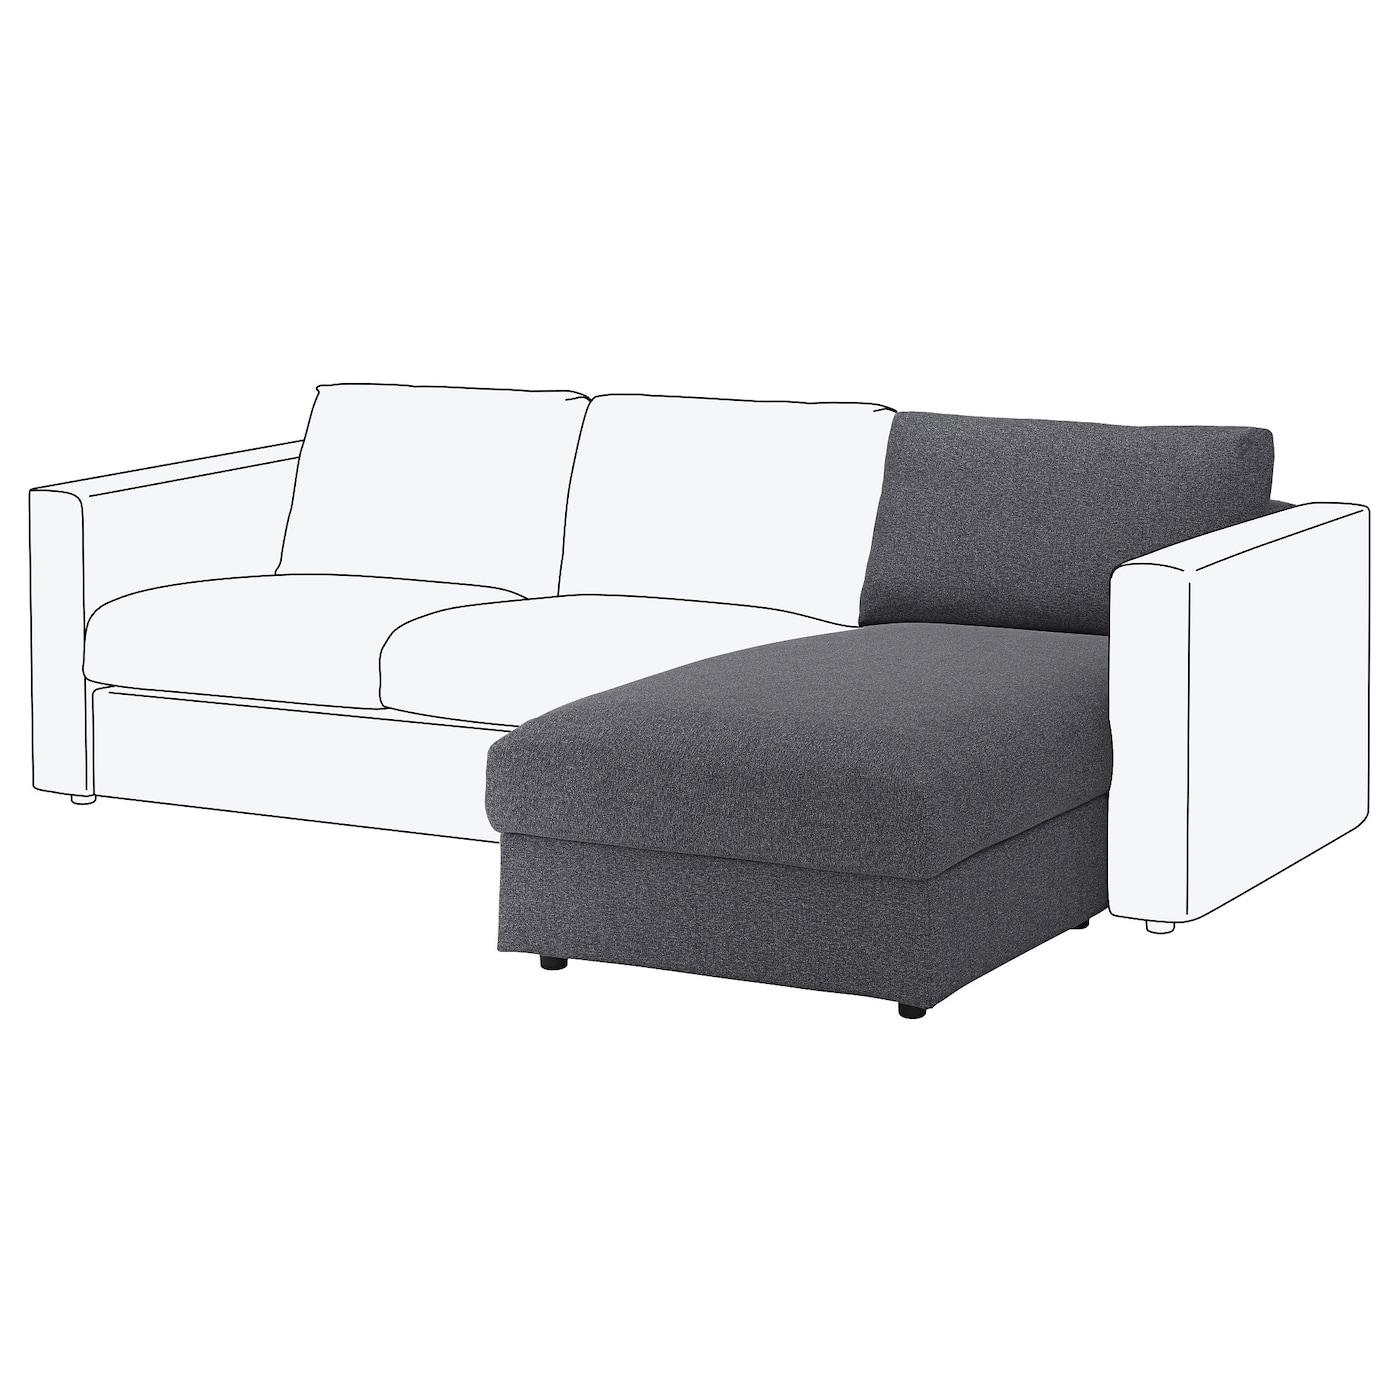 vimle m ridienne gunnared gris moyen ikea. Black Bedroom Furniture Sets. Home Design Ideas